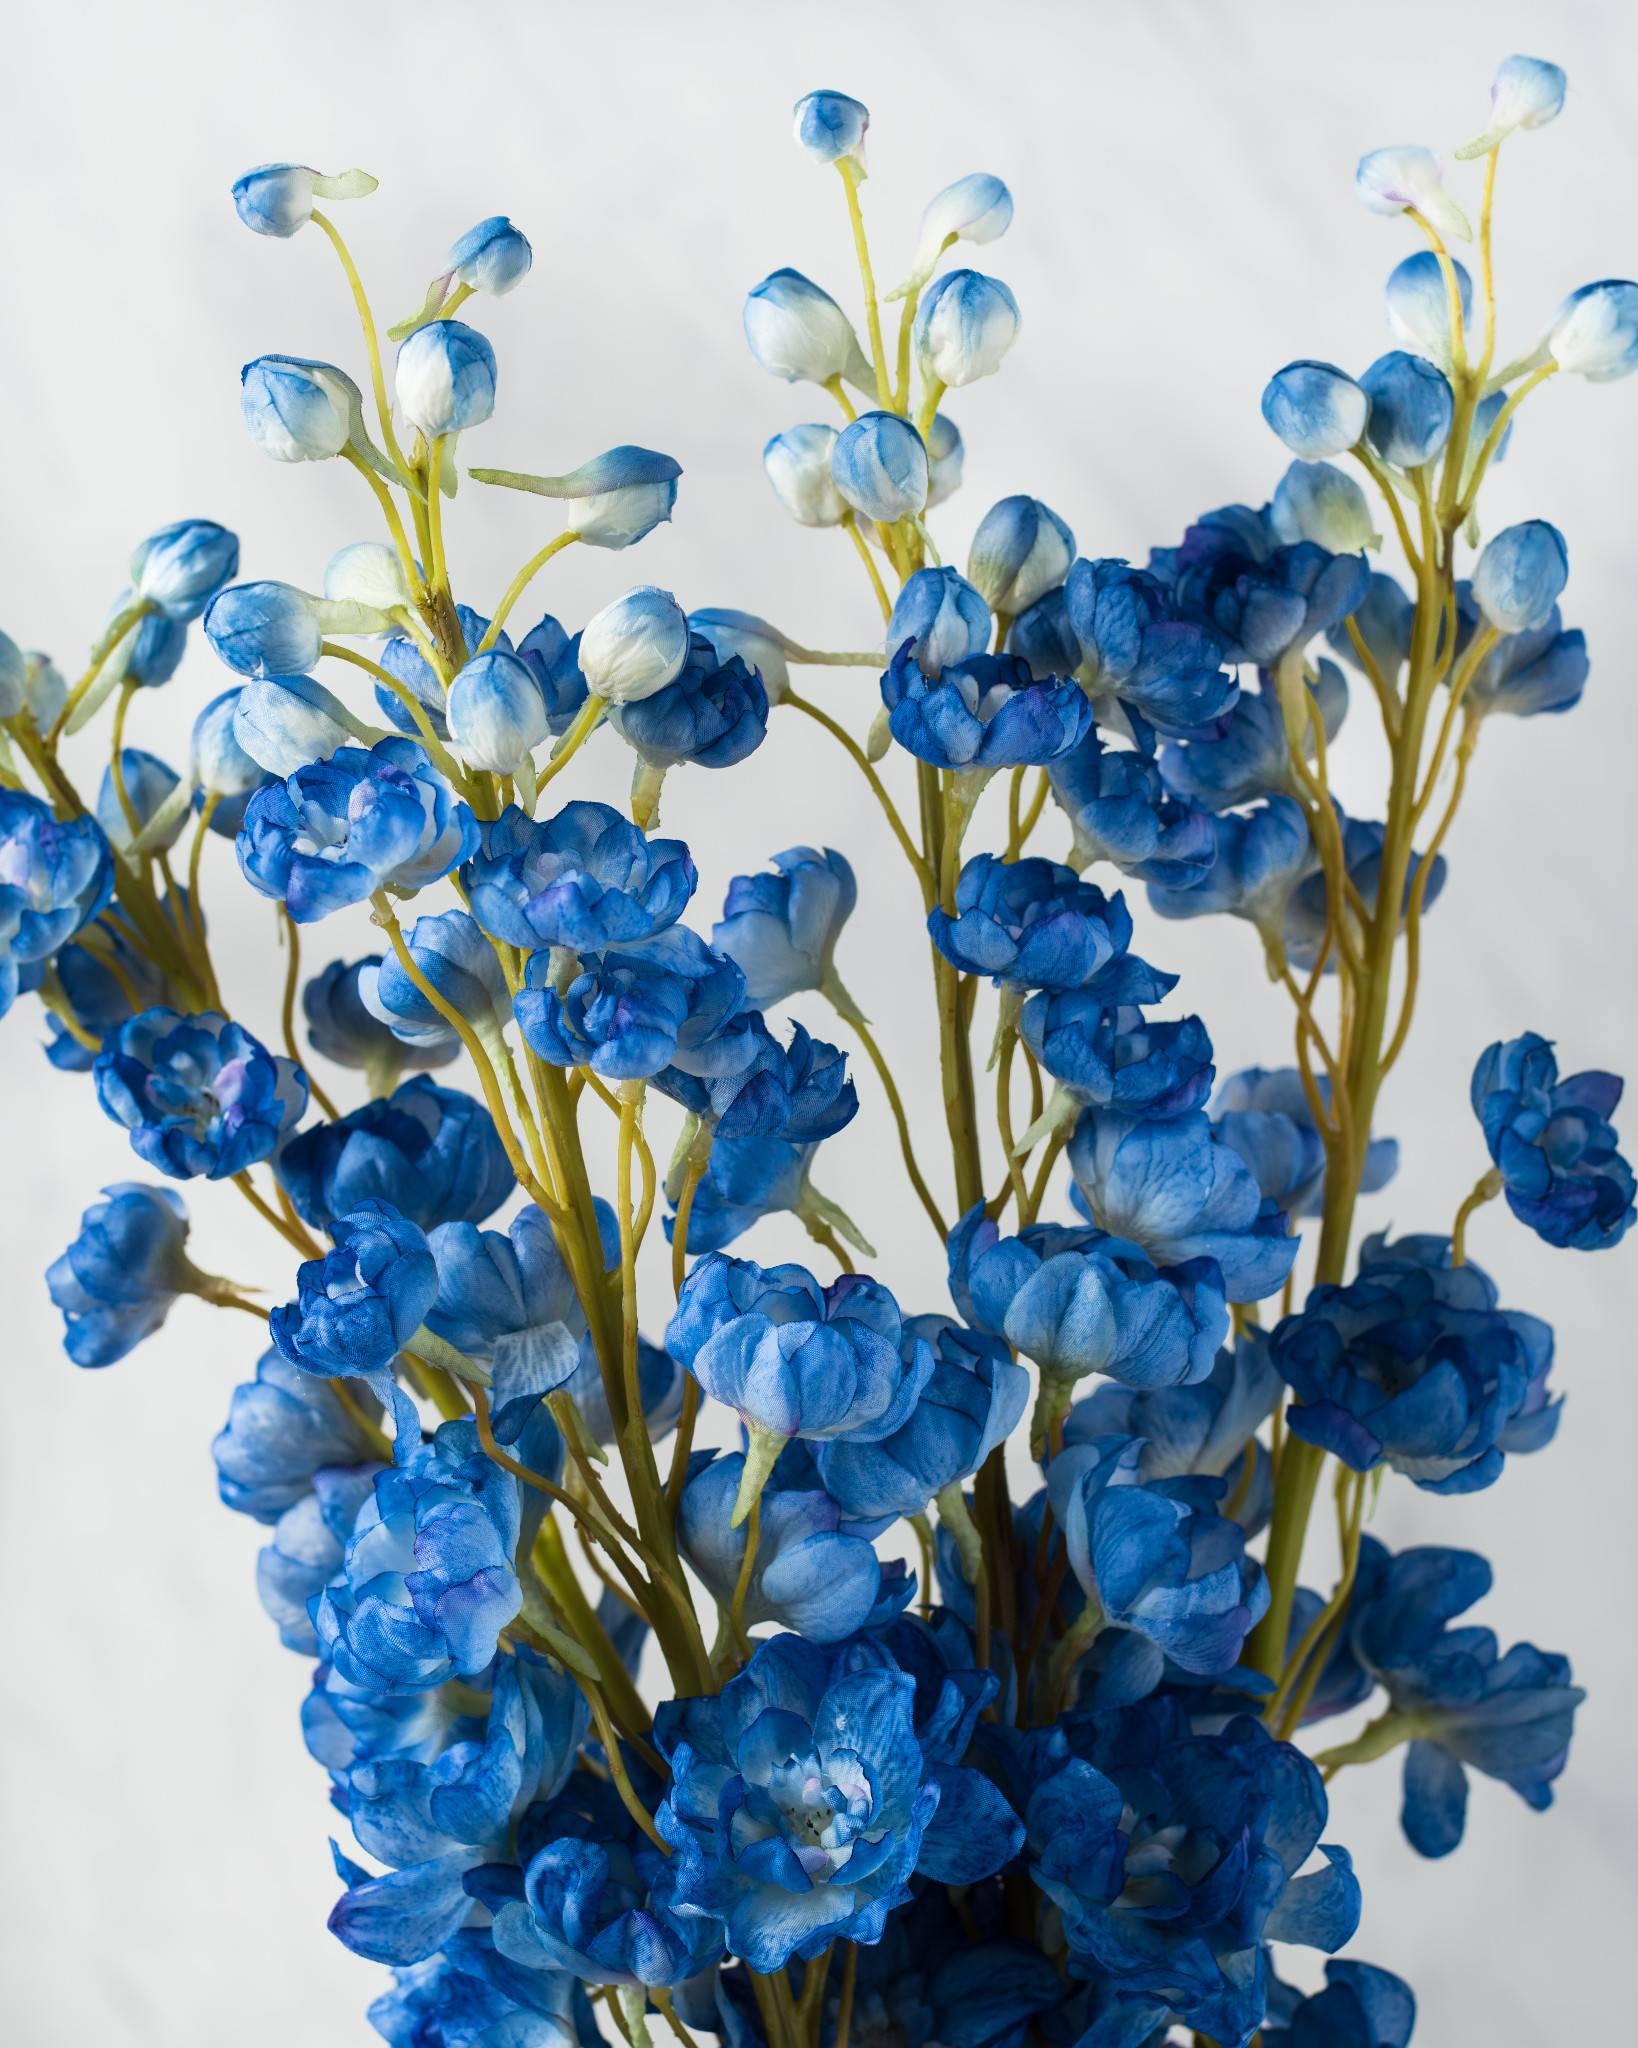 Delphinium Flower Stems Balsam Hill